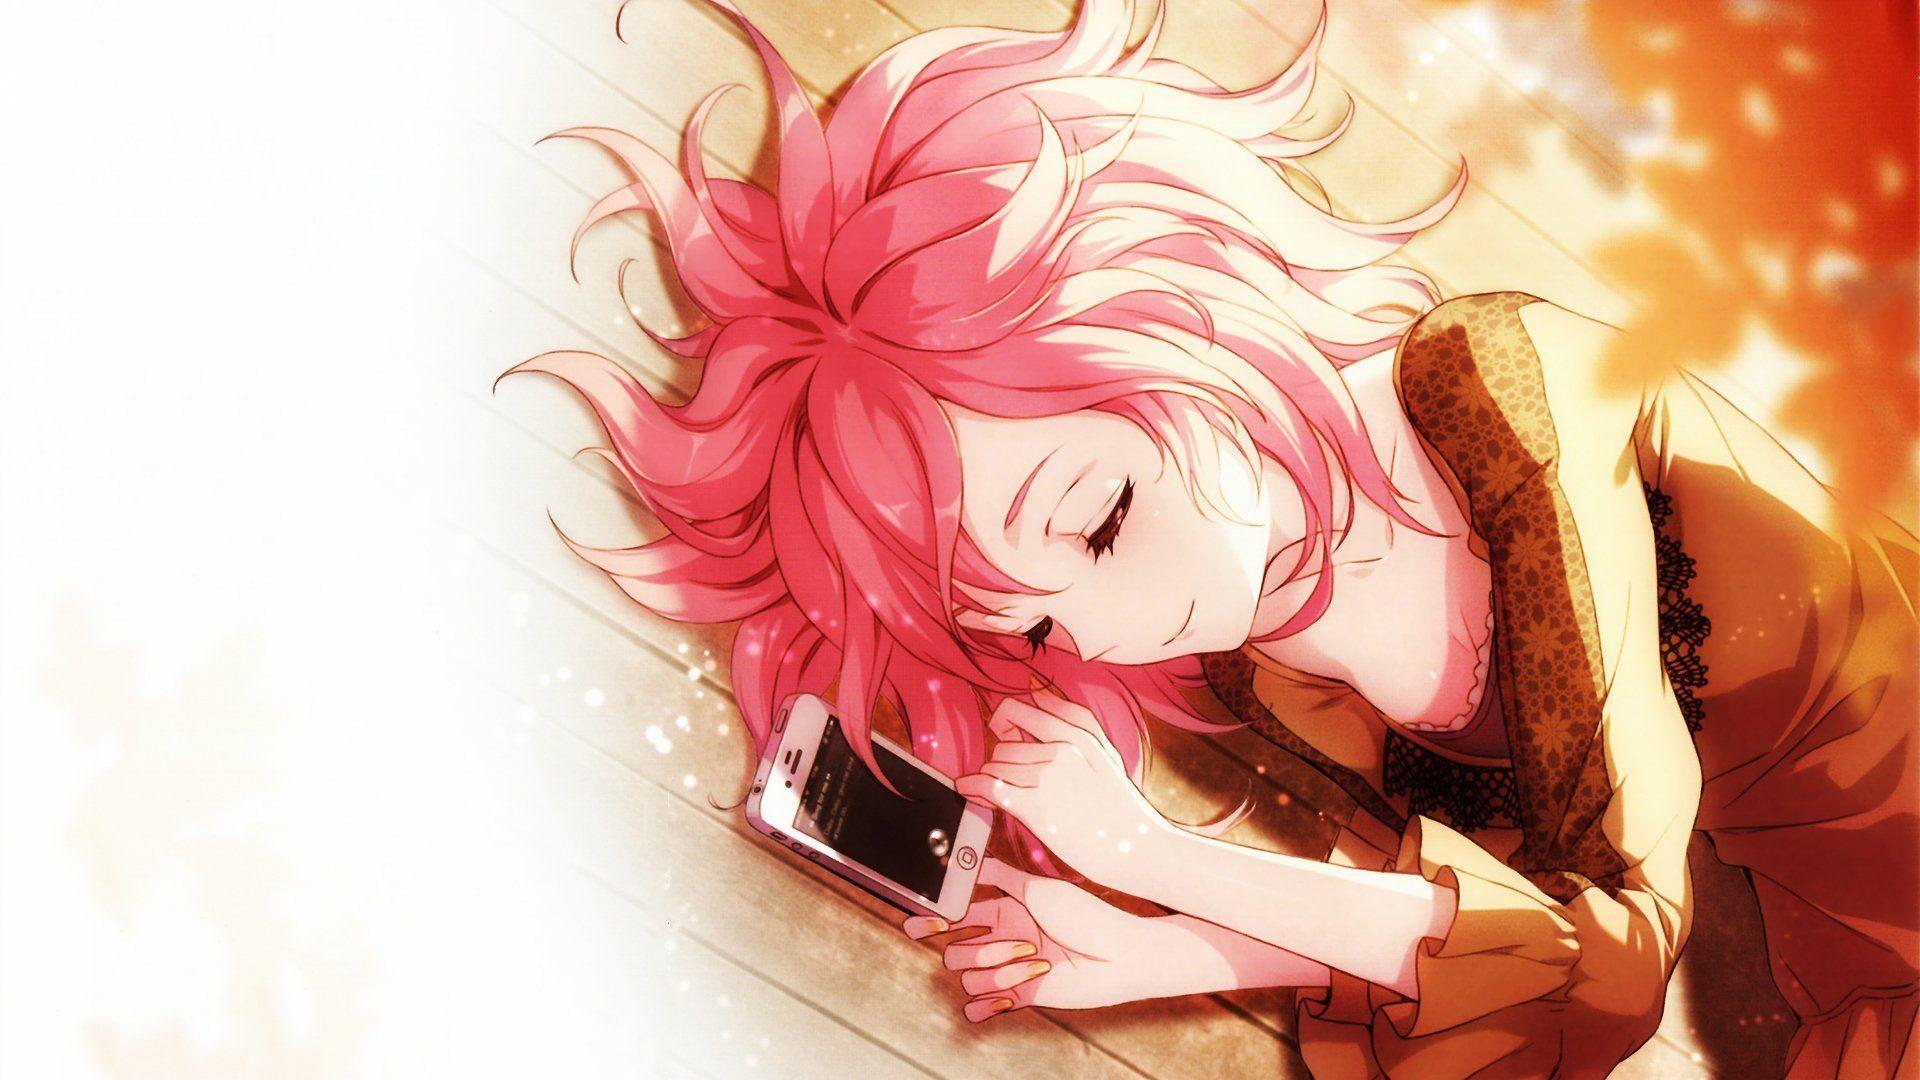 Sleeping Anime Hd Wallpapers Wallpaper Cave